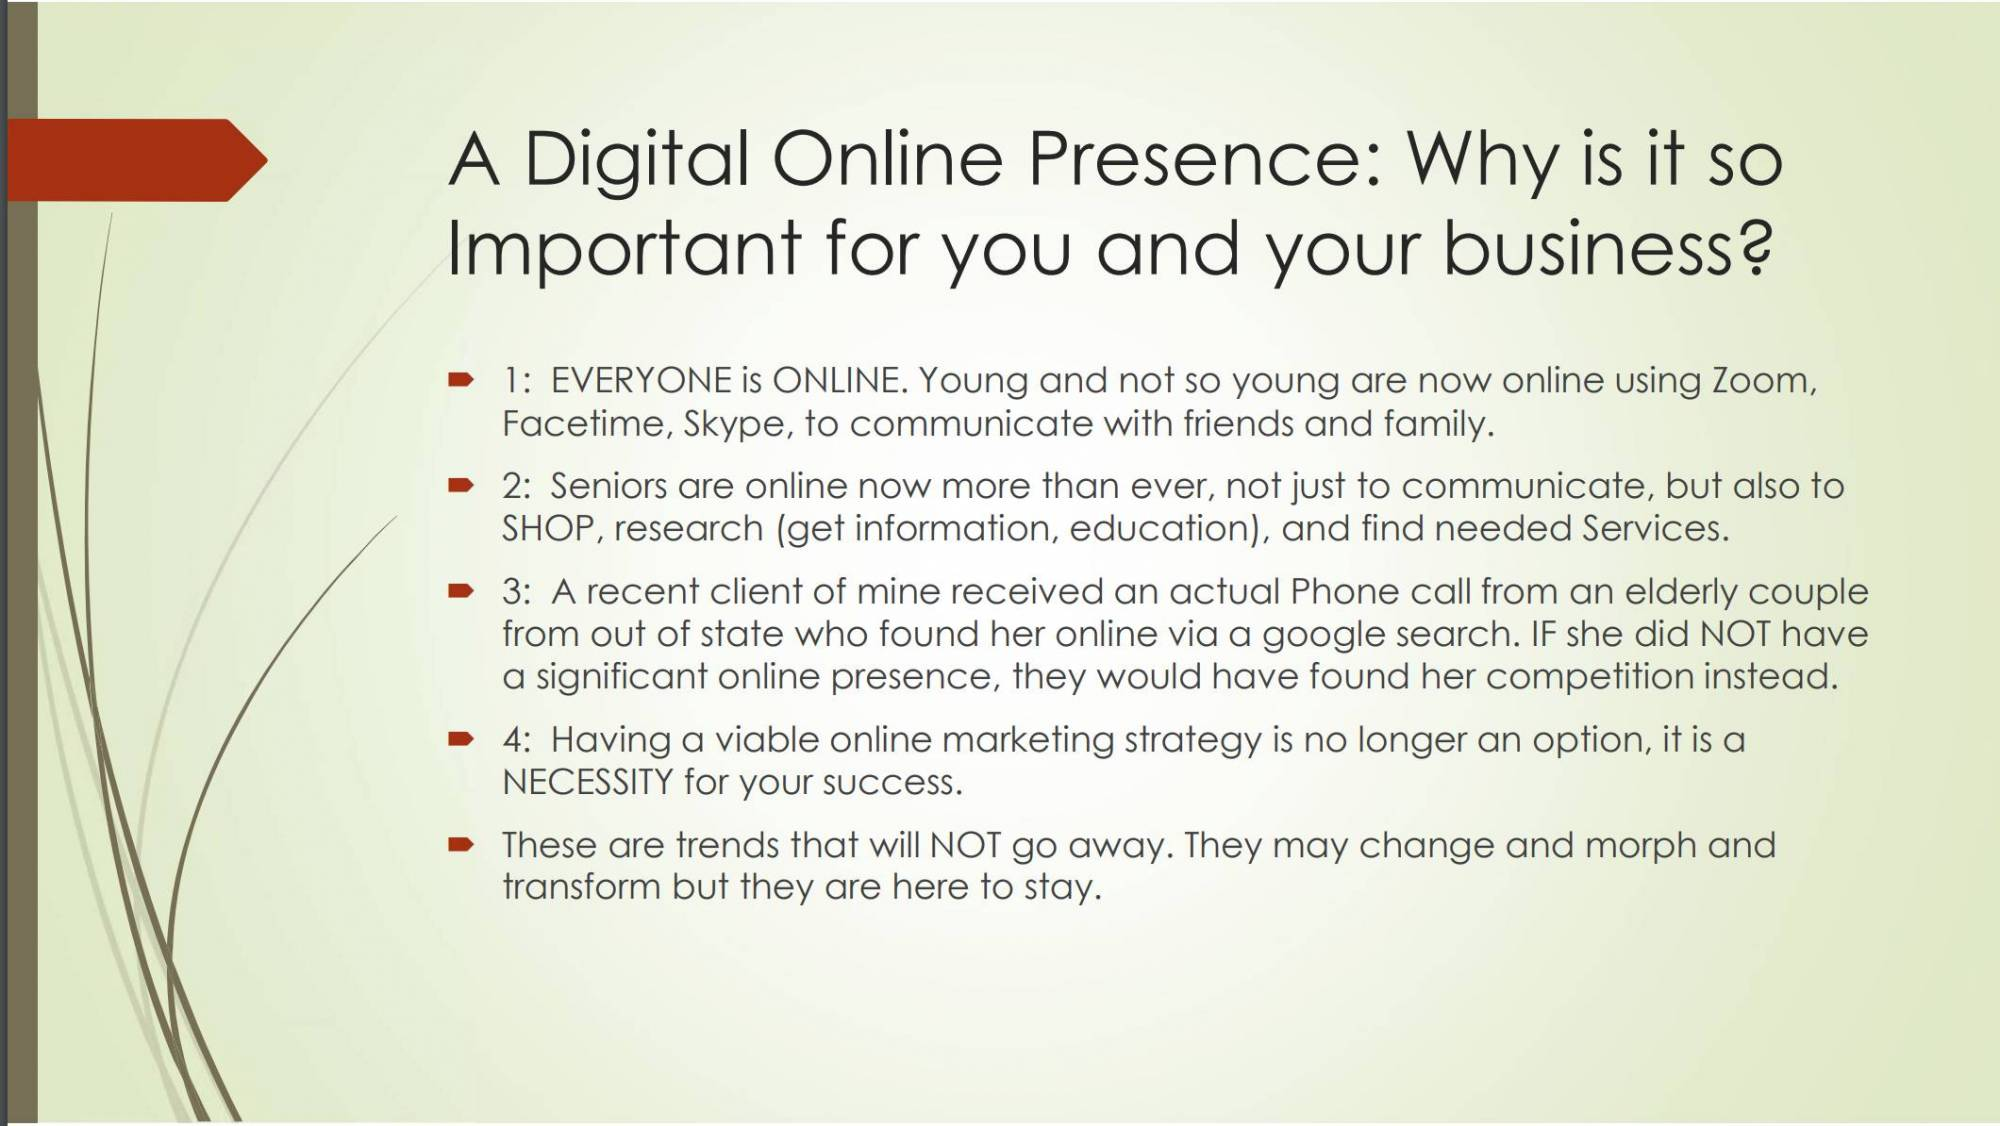 A Digital Online Presence